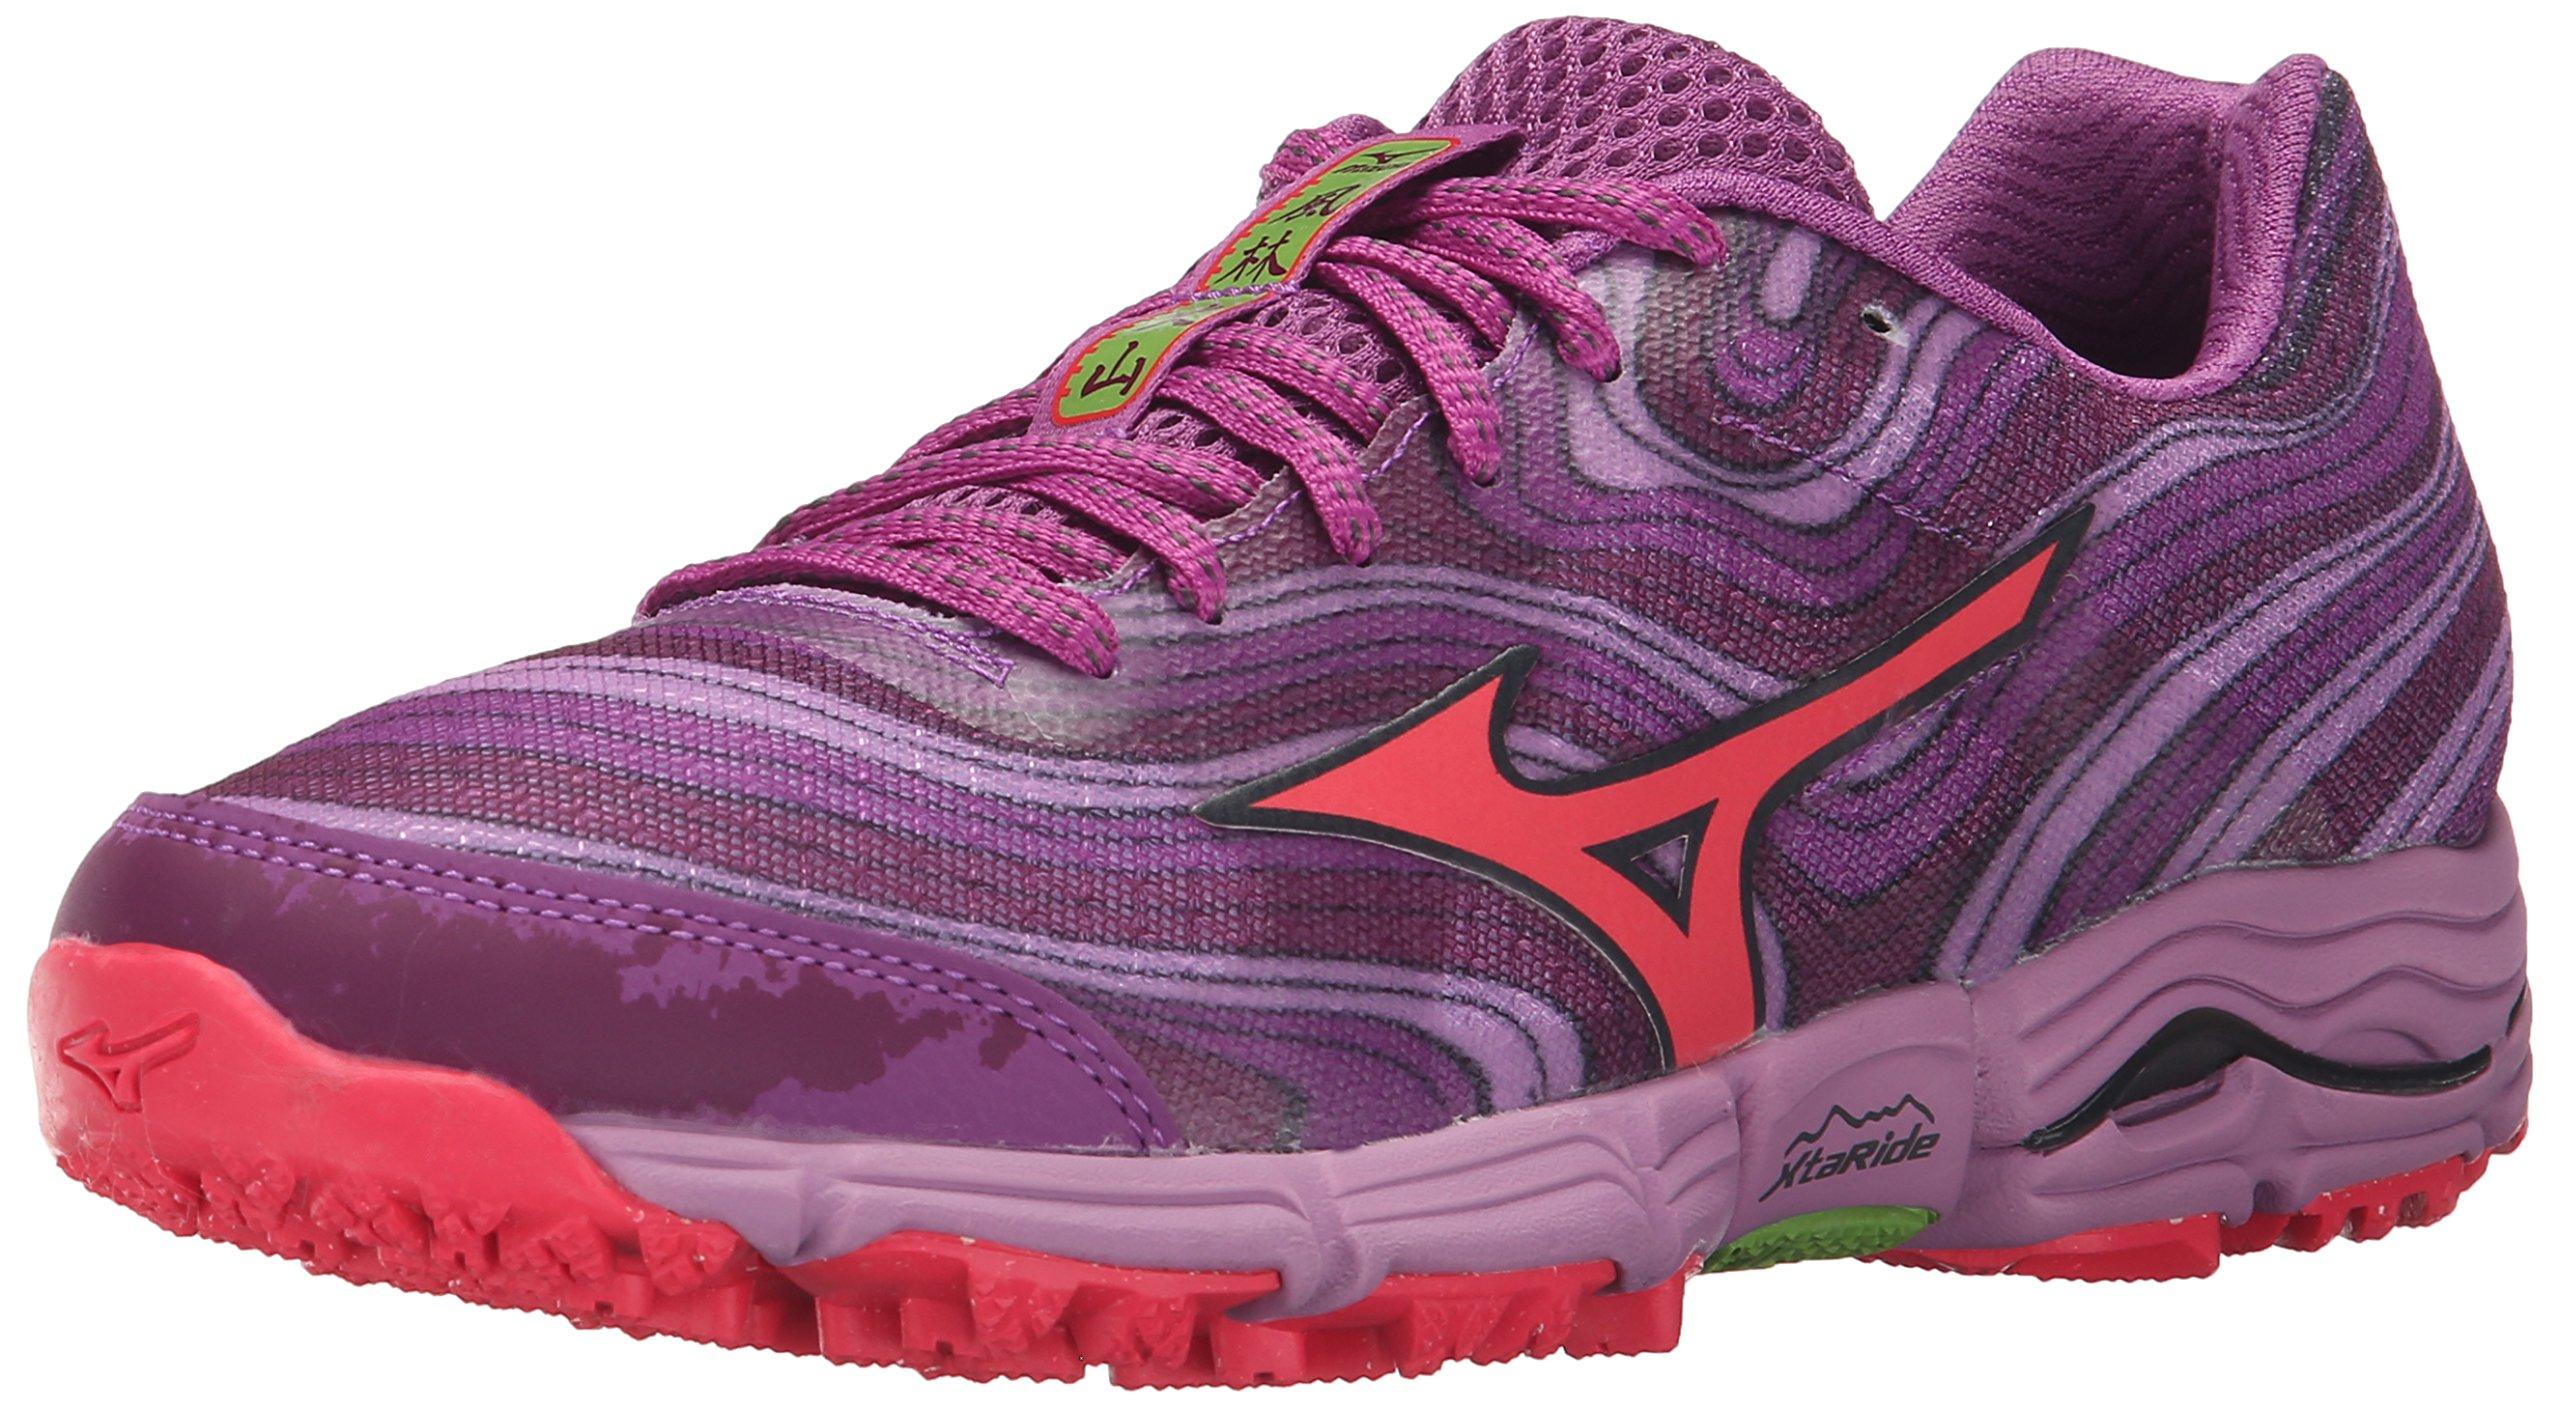 Mizuno Women's Wave Kazan Trail Running Shoe, Purple/Pink, 10 B US